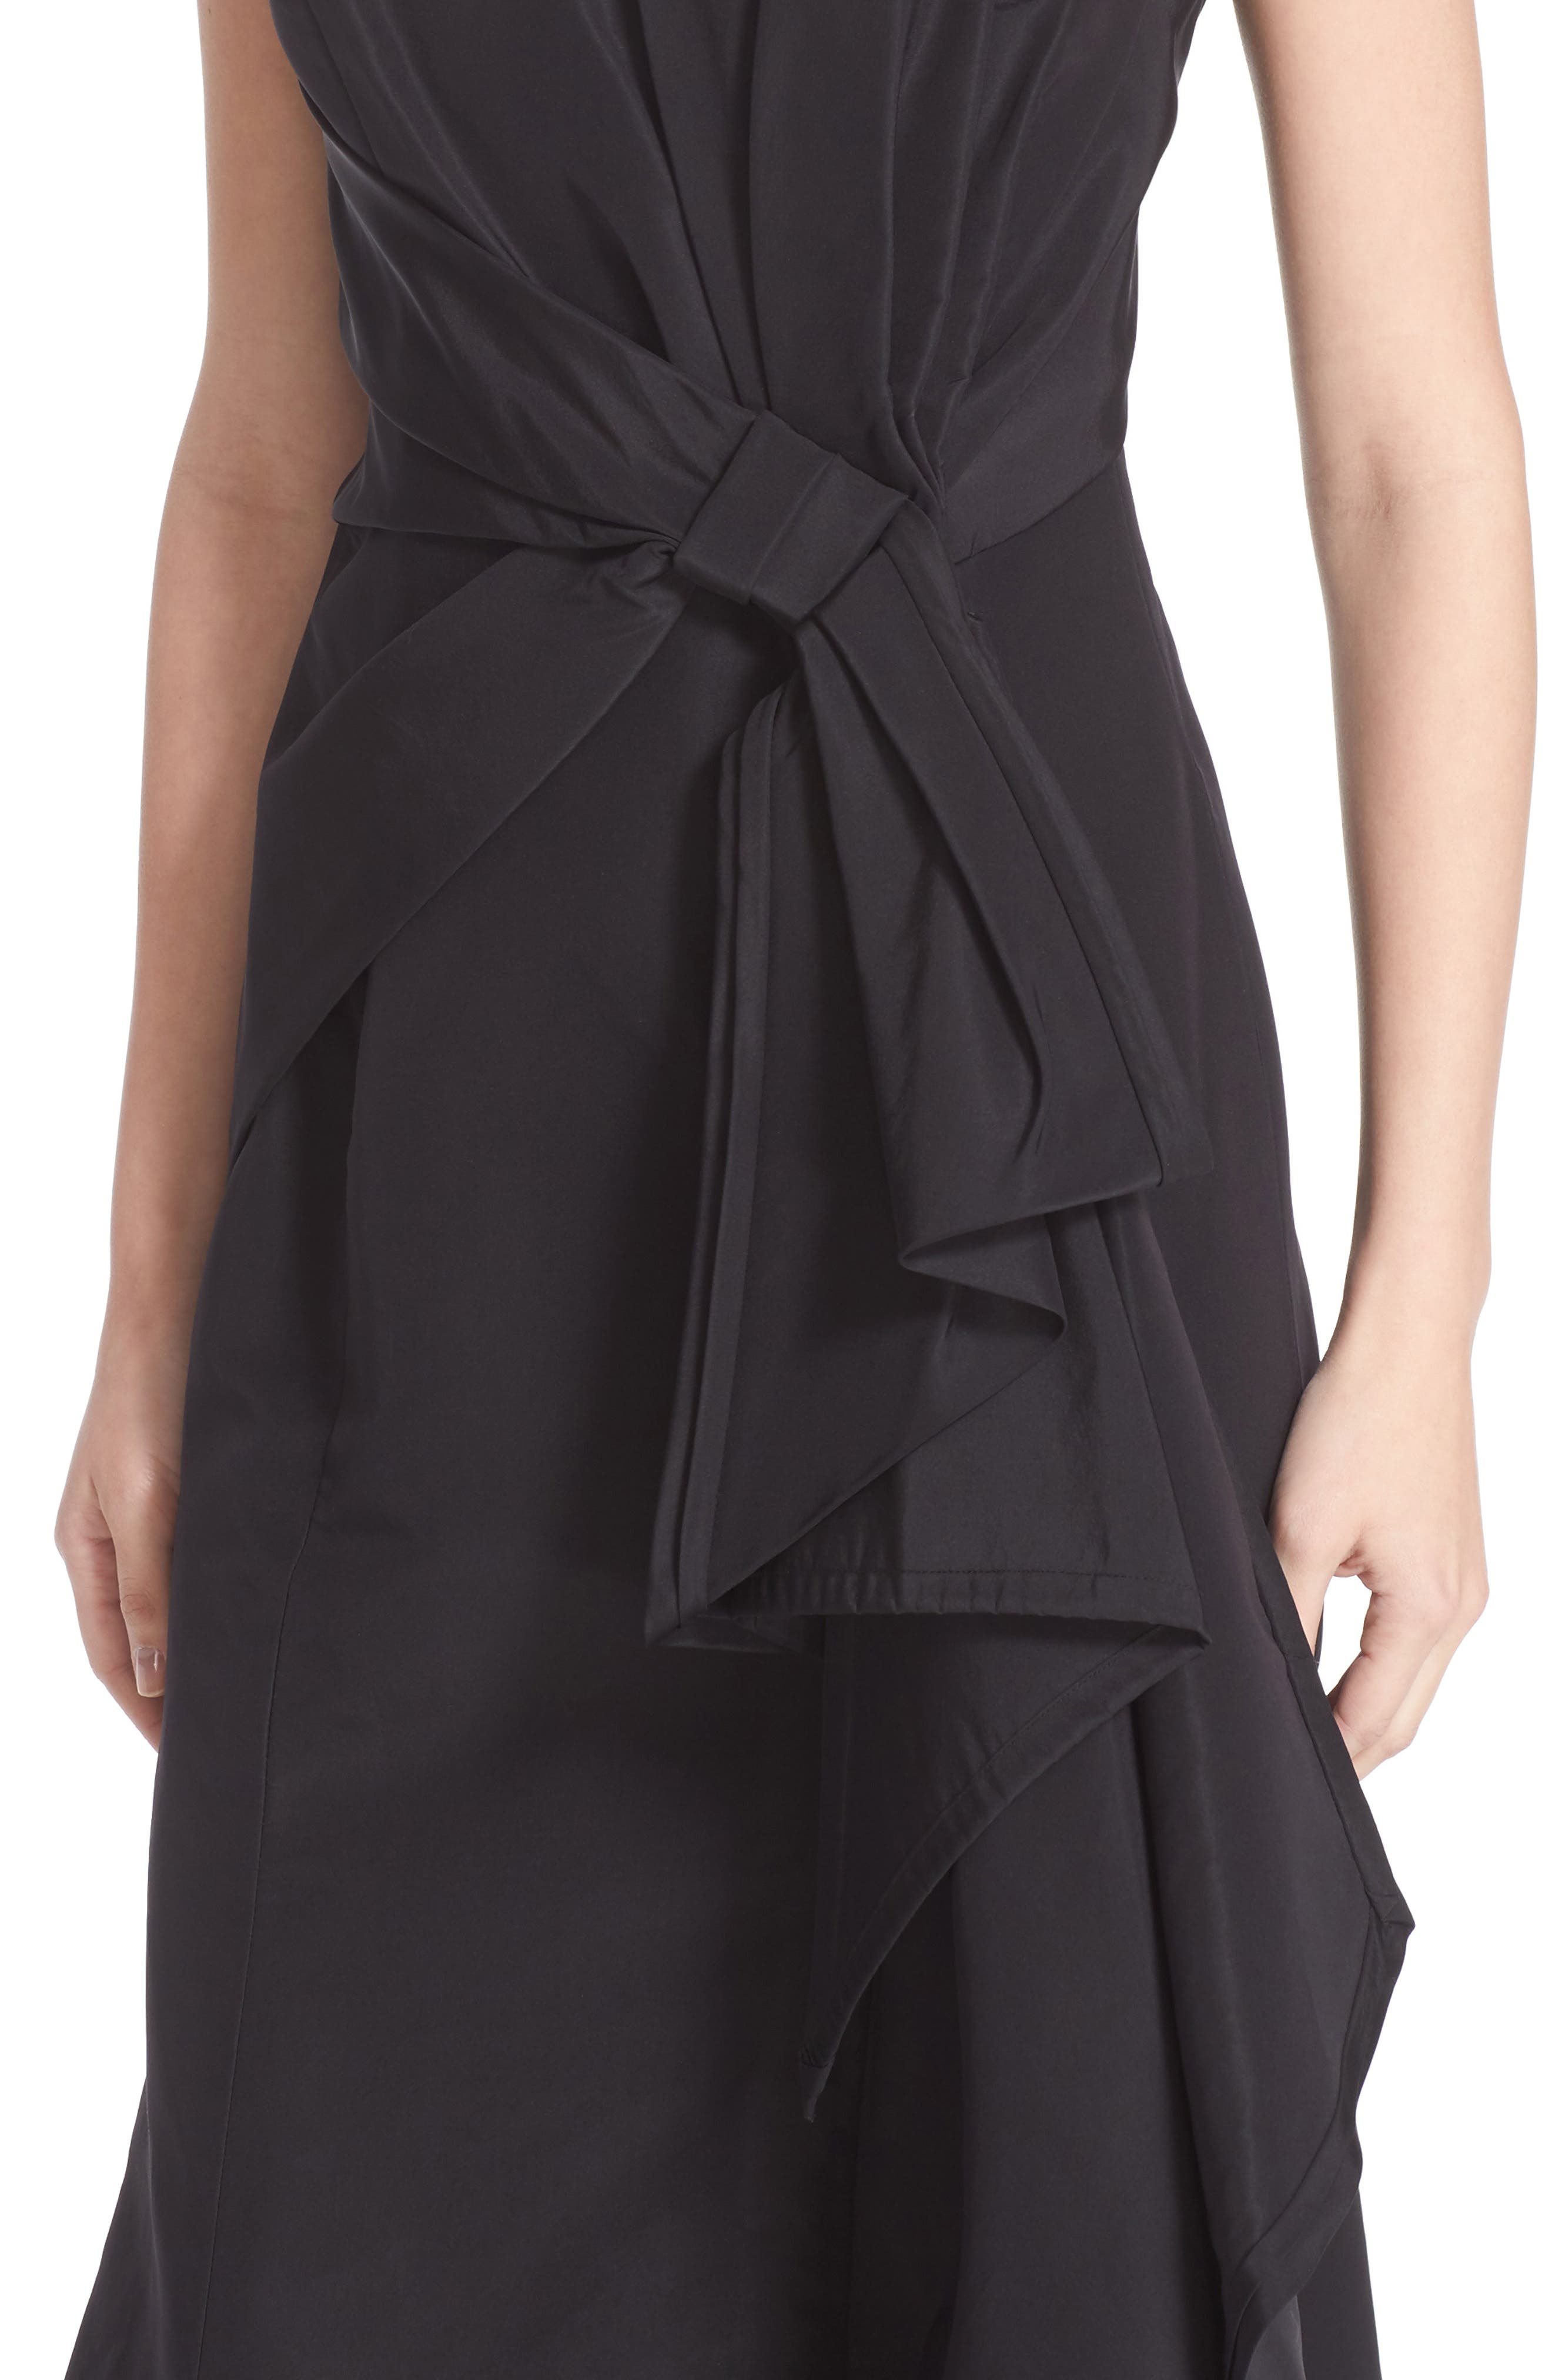 Alternate Image 4  - Carolina Herrera Bow Detail Strapless Silk Faille Gown (Nordstrom Exclusive)